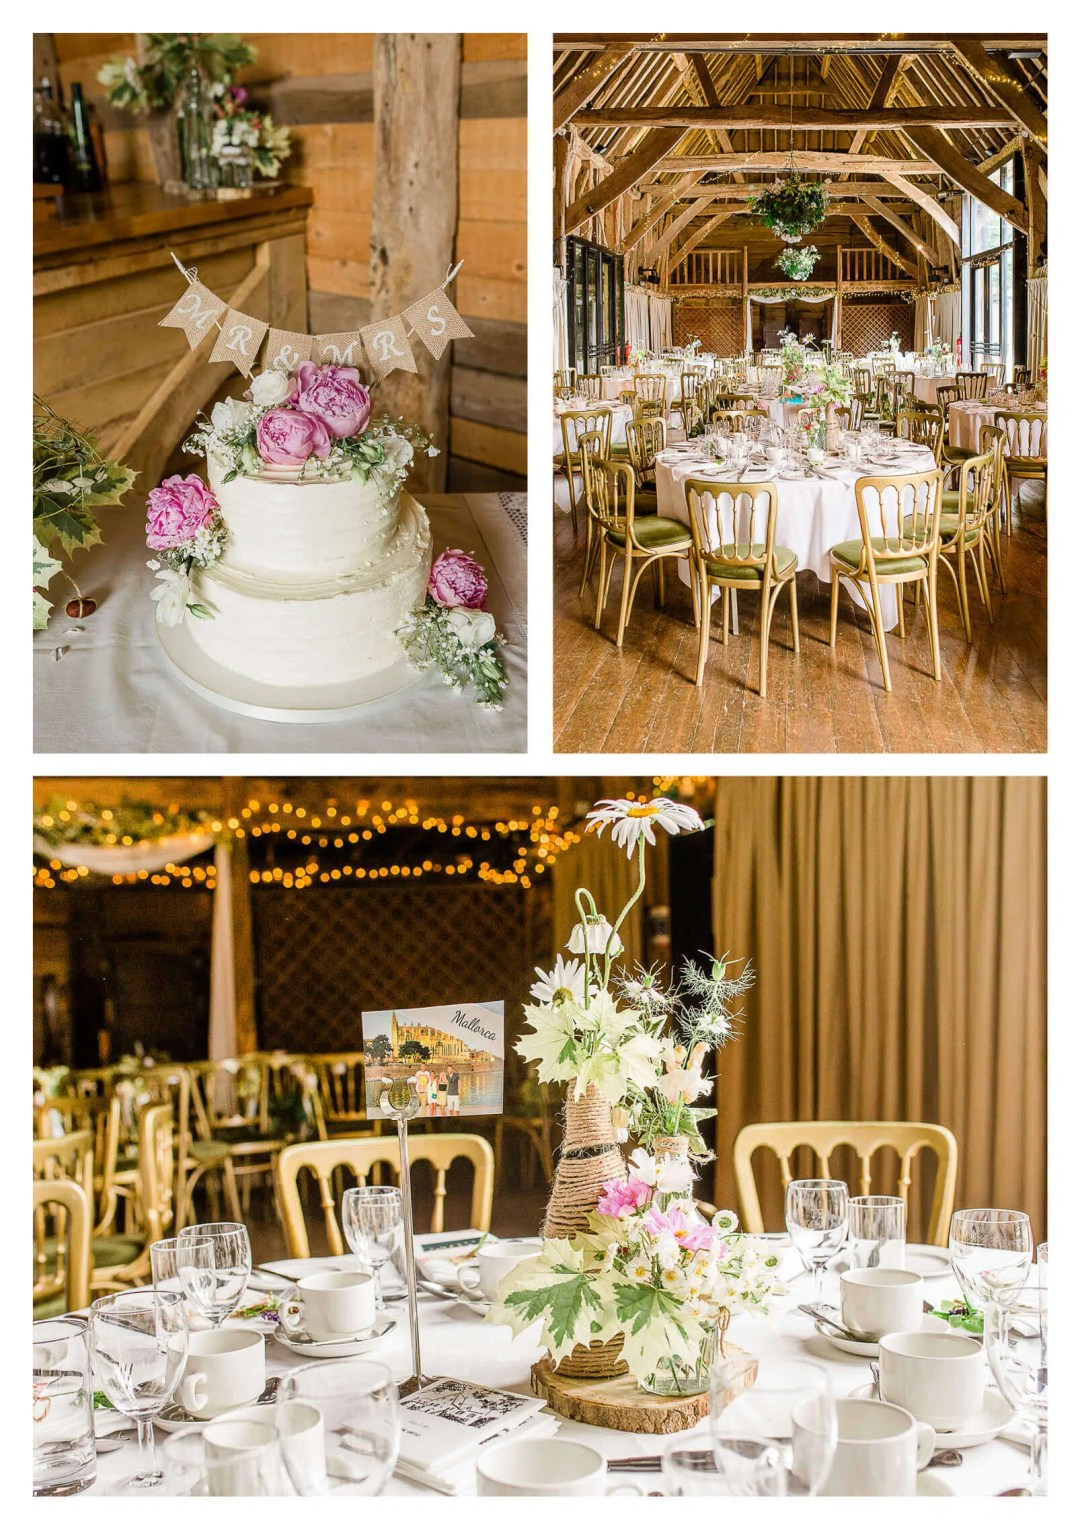 Michelham Priory Barn wedding breakfast decorations | East Sussex Wedding Photographer